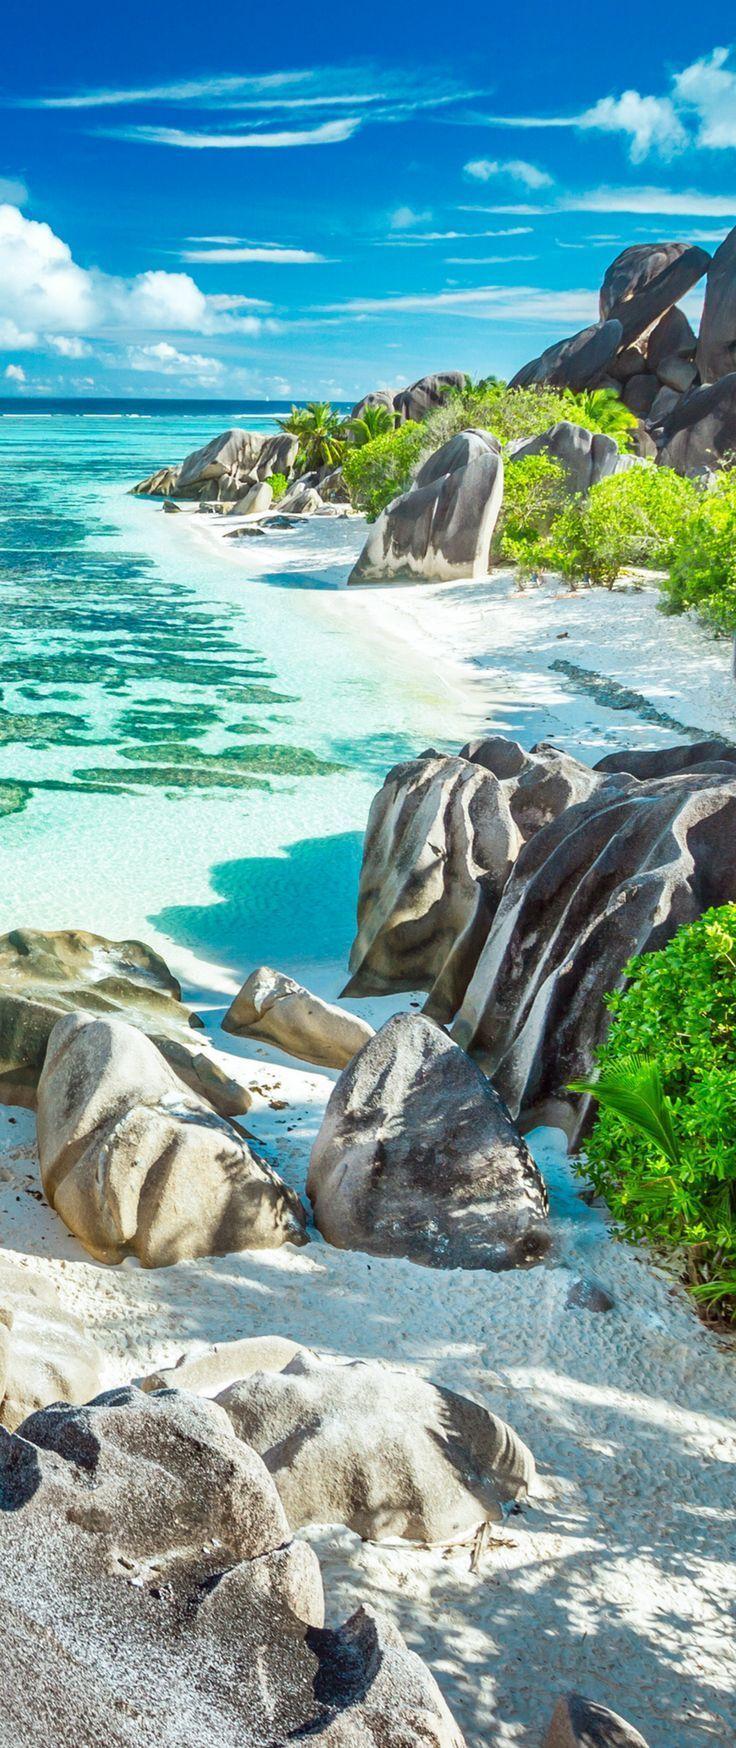 Seychelles Travel Guide: The Best Beach Destinatio…